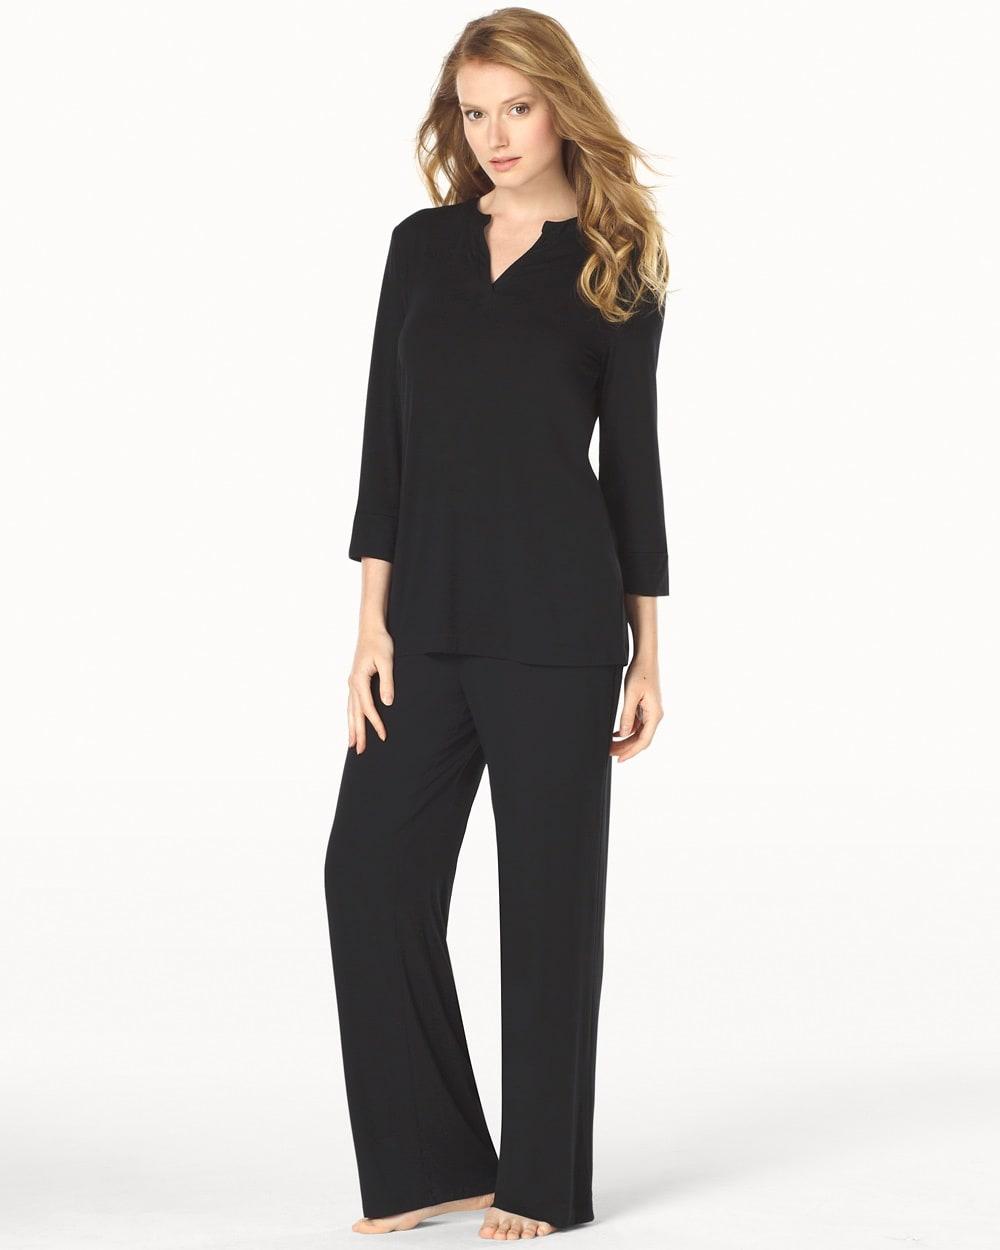 69ac05c220 Return to thumbnail image selection Popover Pajama Top Black